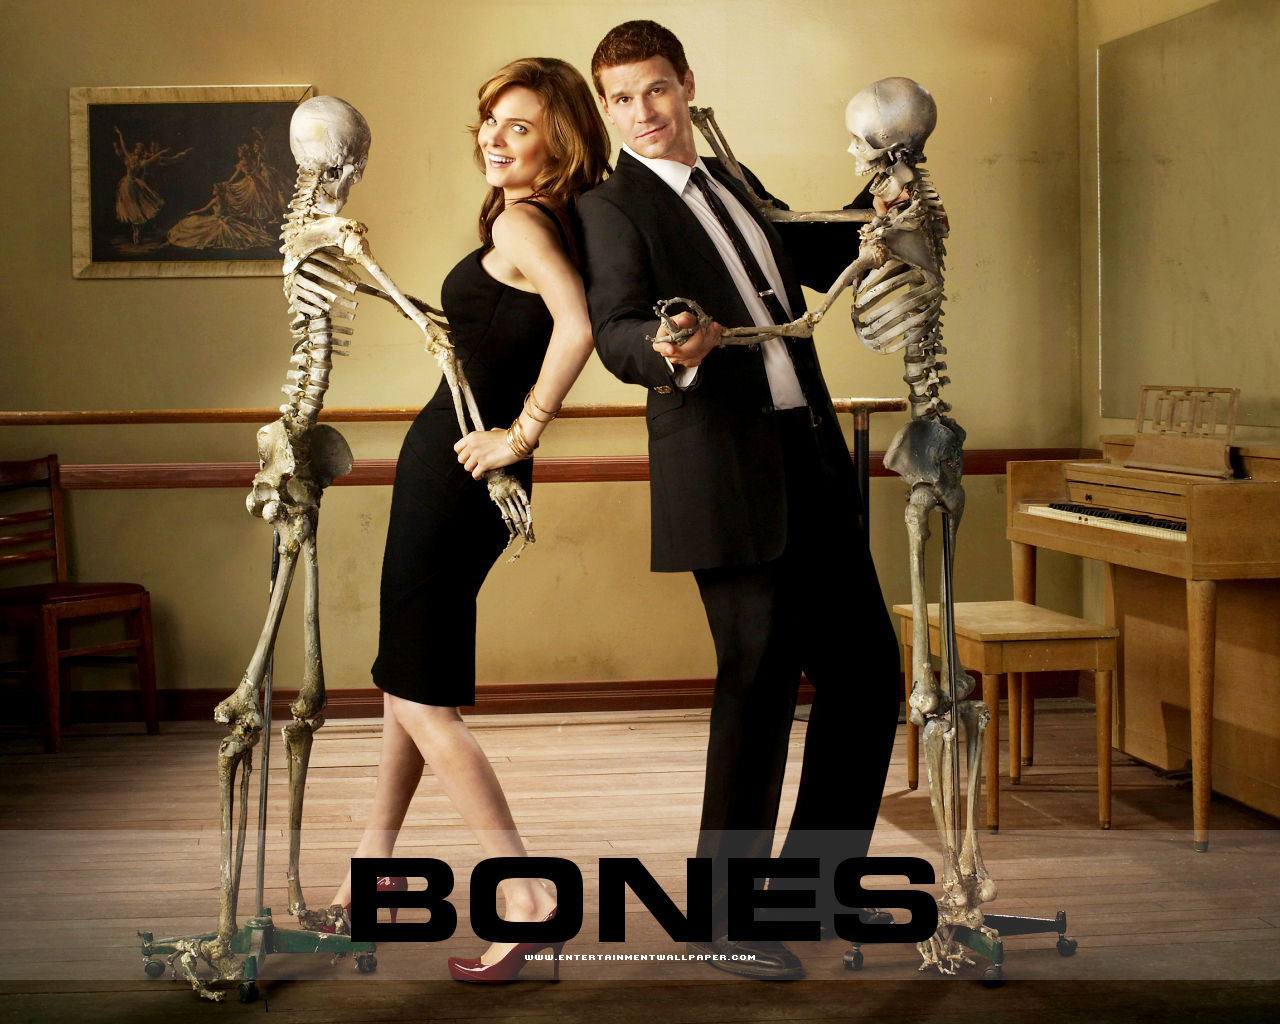 http://1.bp.blogspot.com/_923ogQ0alTo/THv-Zim9XII/AAAAAAAAAeA/UdDAo5c9ZGk/s1600/bones-booth-wallpaper-4.jpg